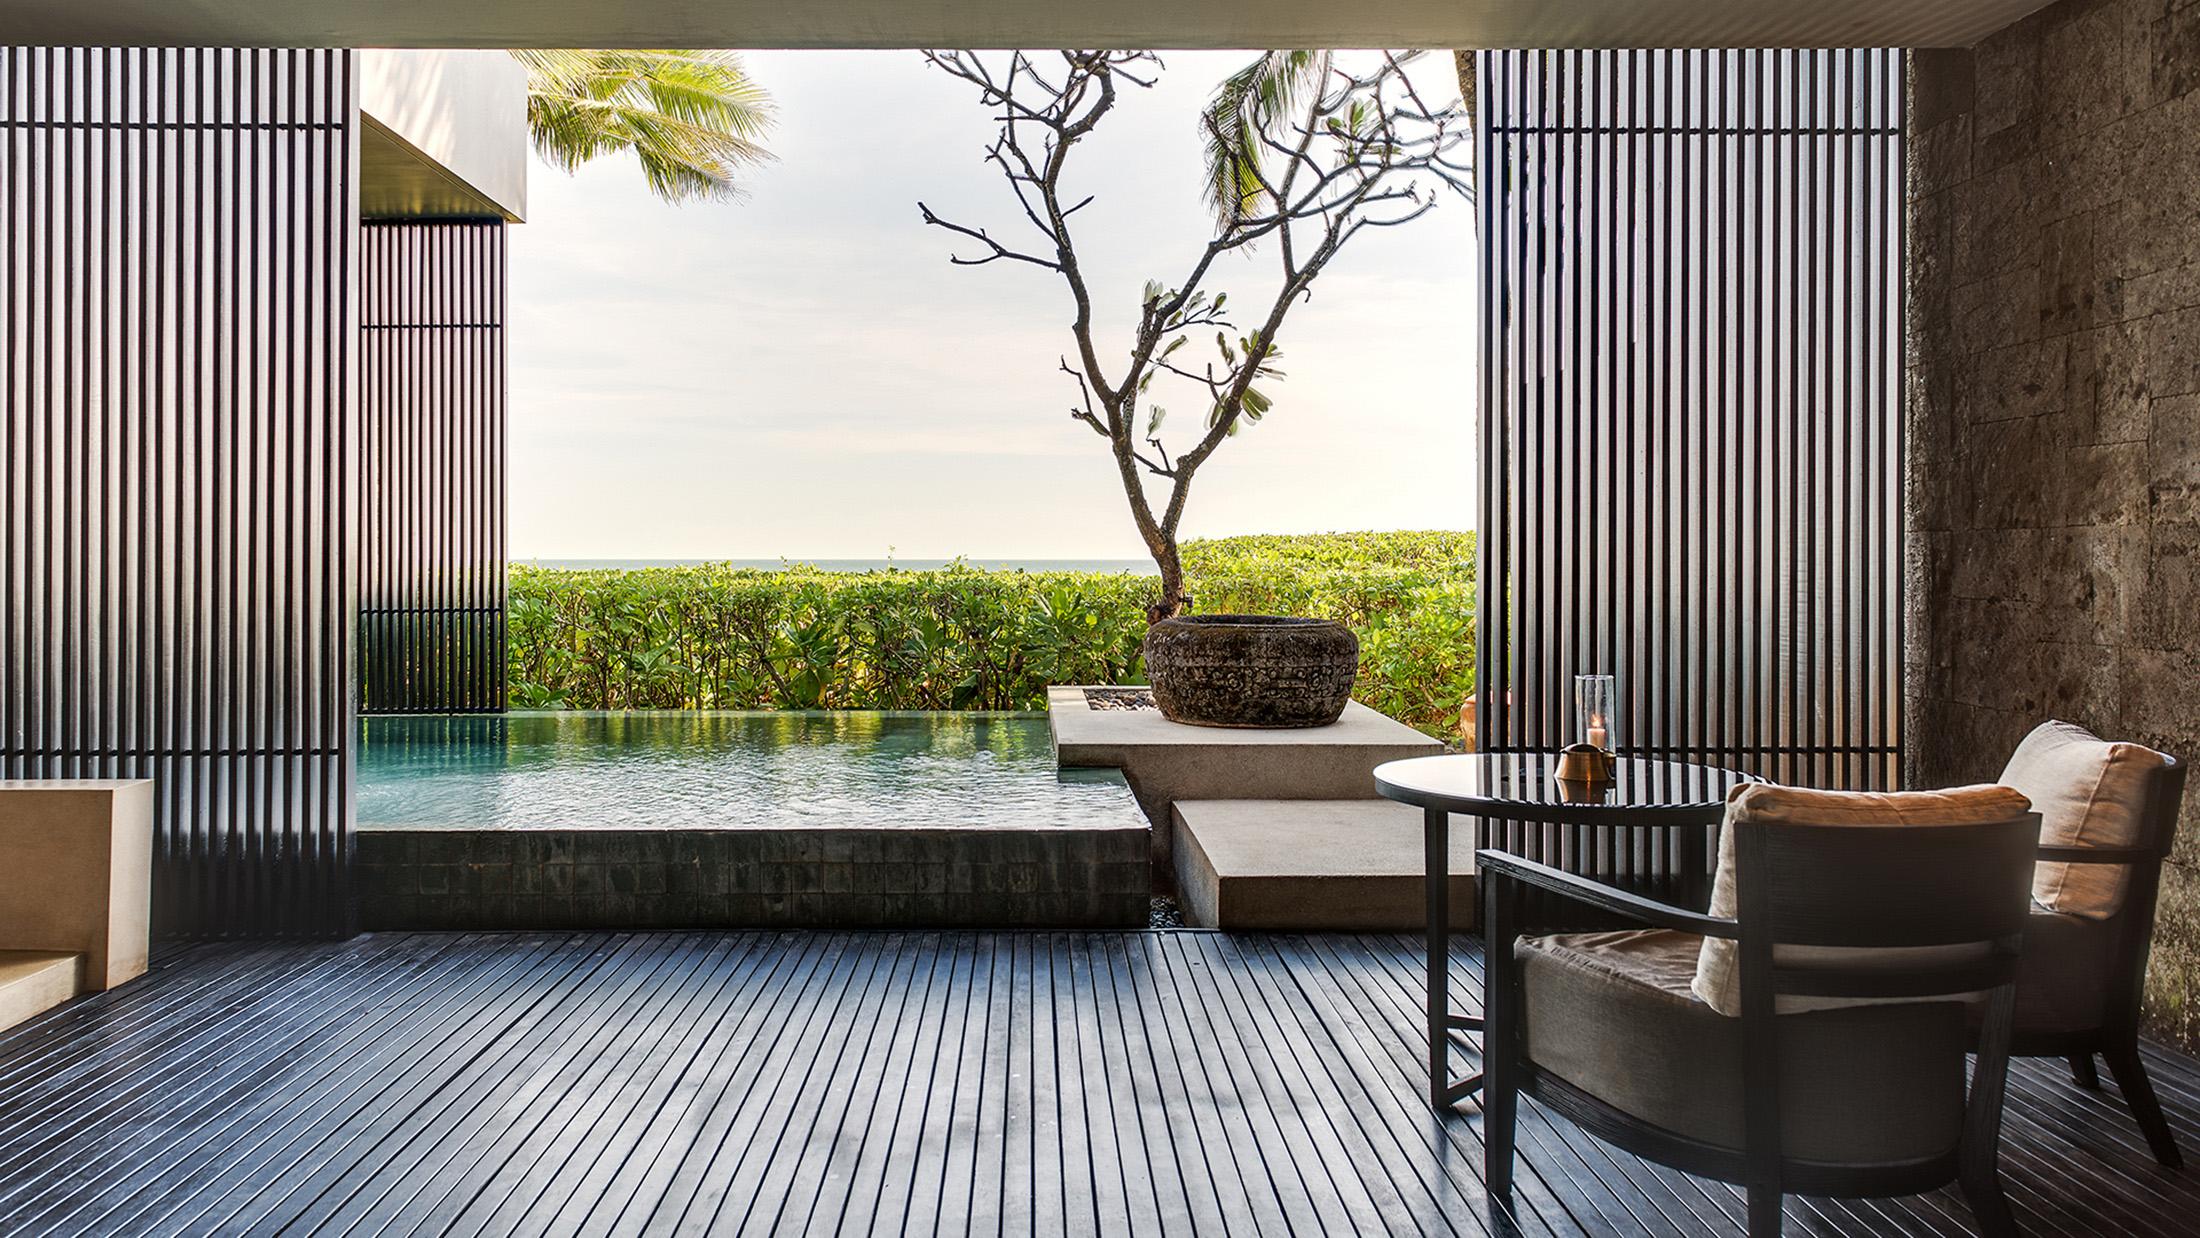 Soori Bali - Luxury beach resort Bali